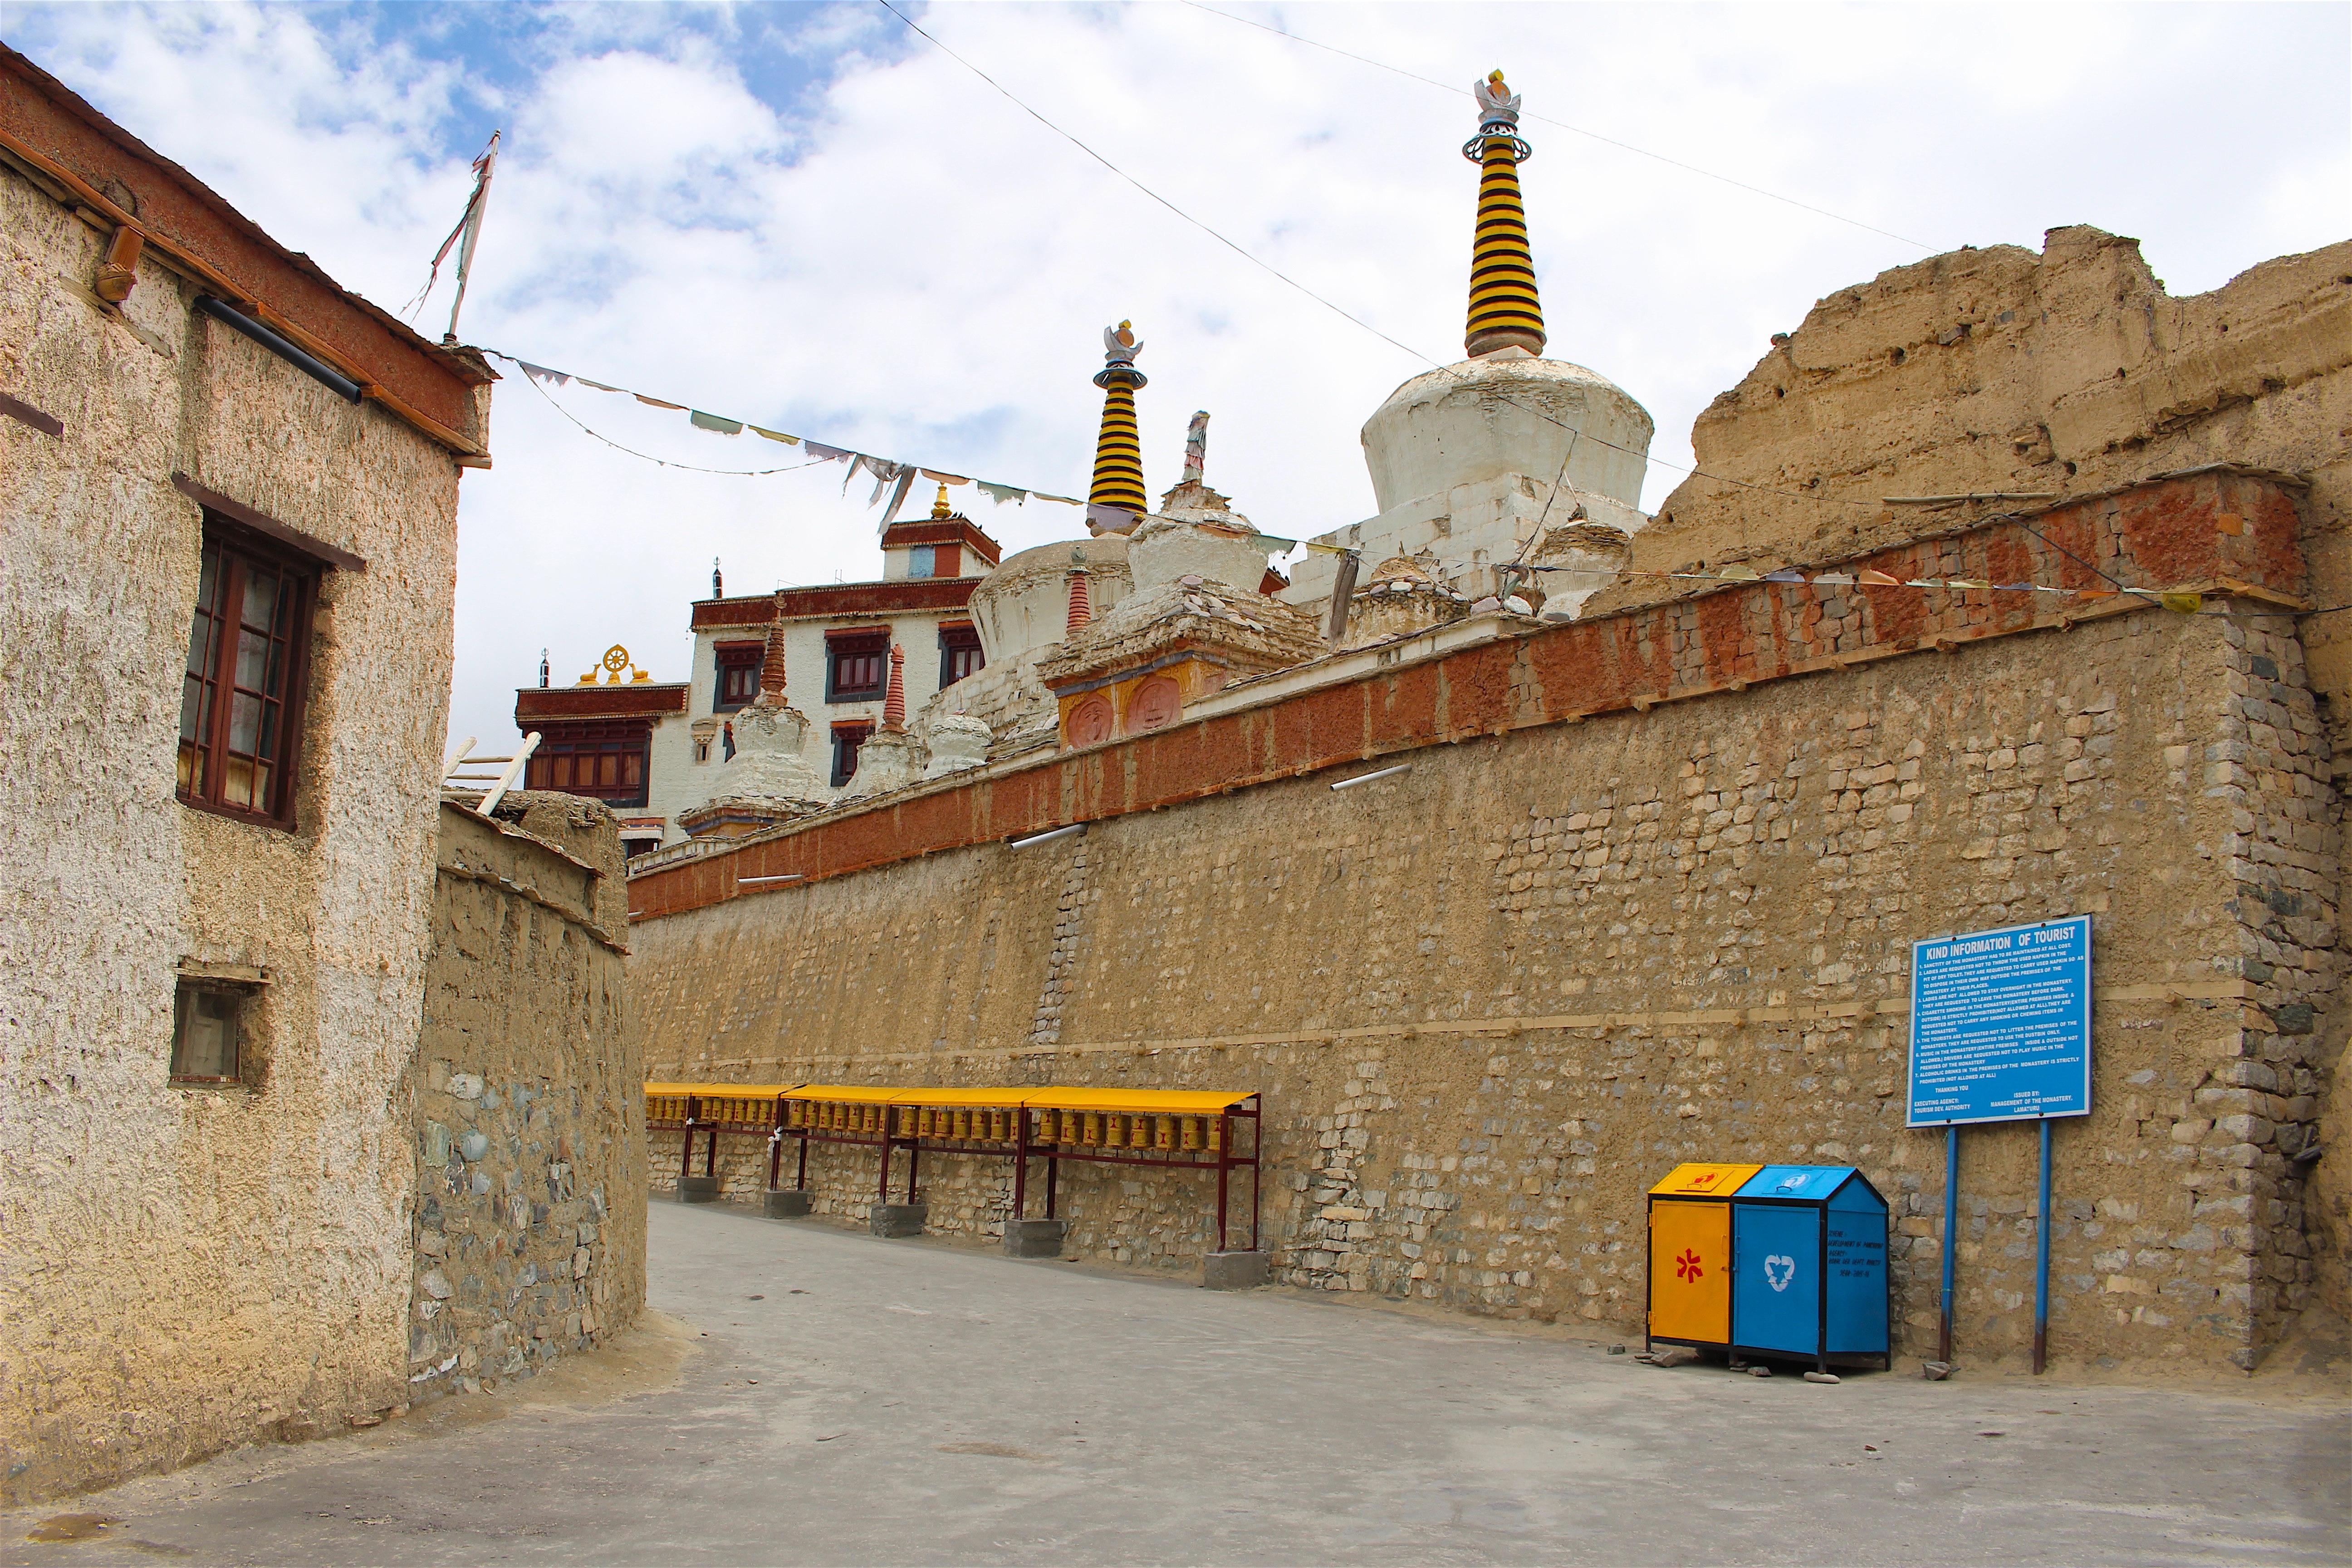 Lamayuru, Ladakh, India